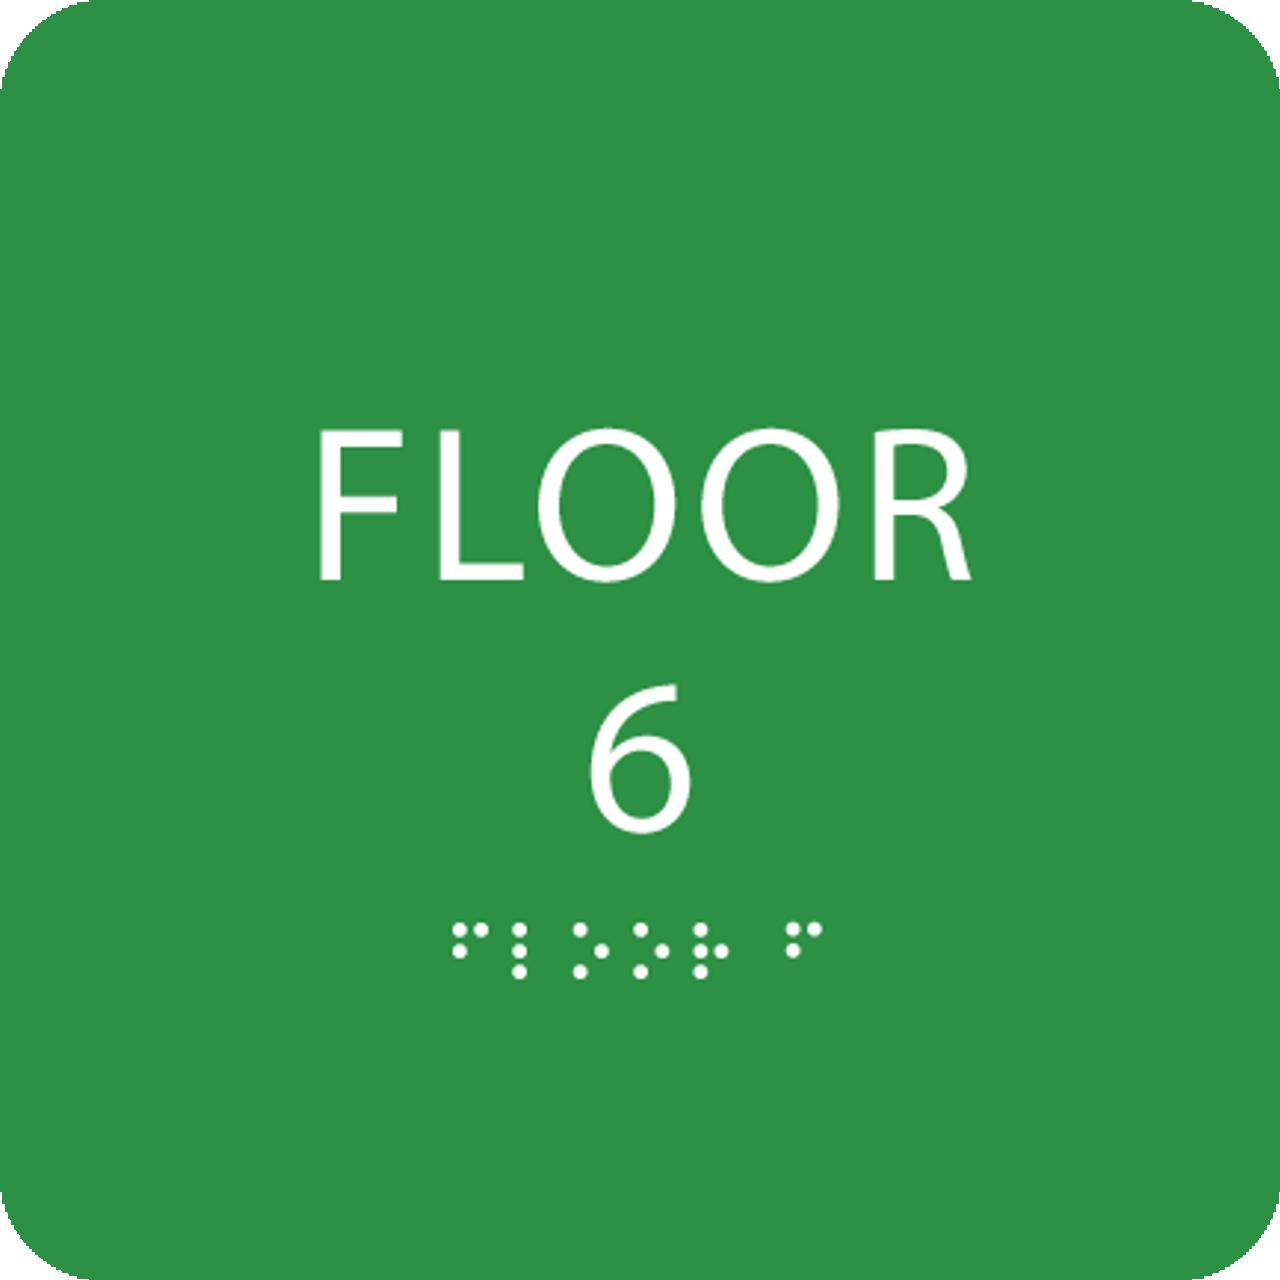 Green Floor 6 Level Identification ADA Sign